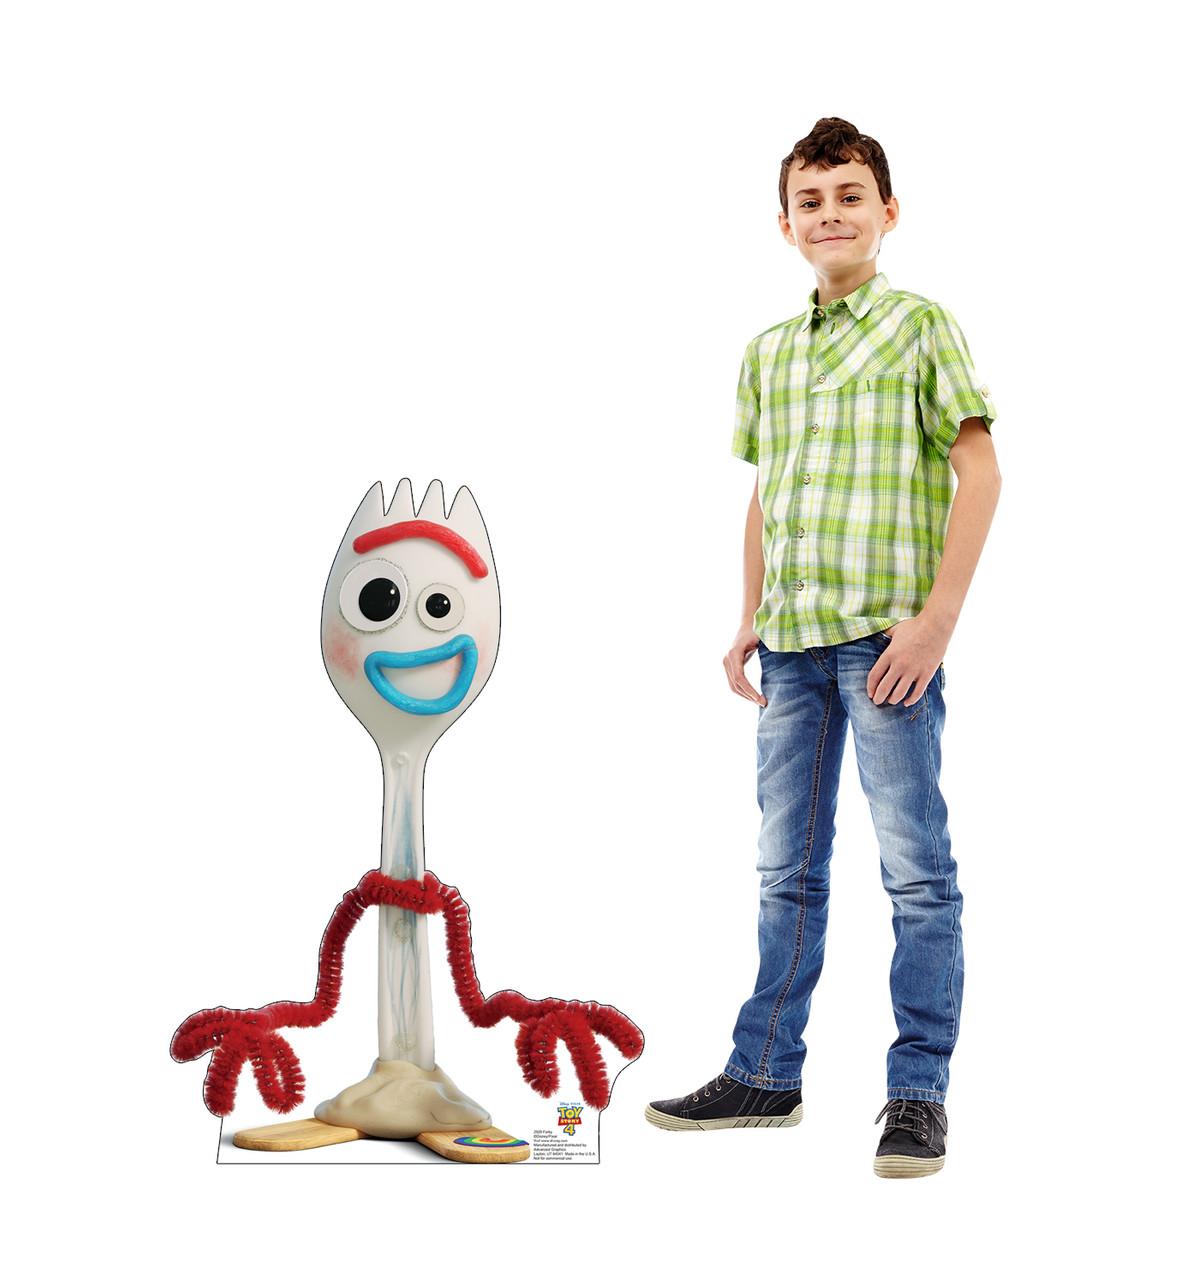 Forky - Toy Story 4 Cardboard Cutout Lifesize